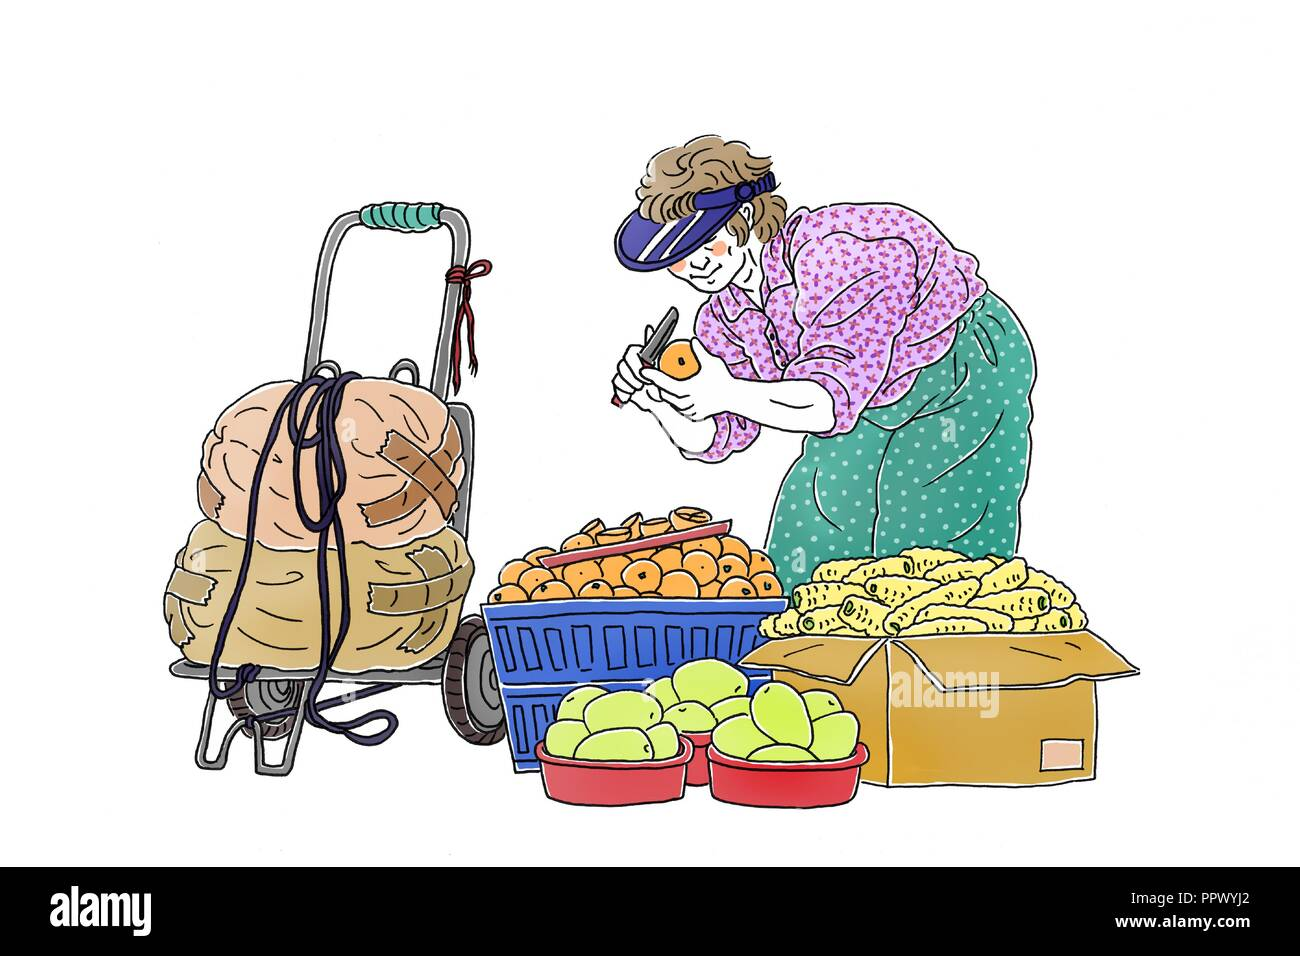 Vector - Korea's traditional market merchants,  Vintage hand drawn illustration. 011 - Stock Image